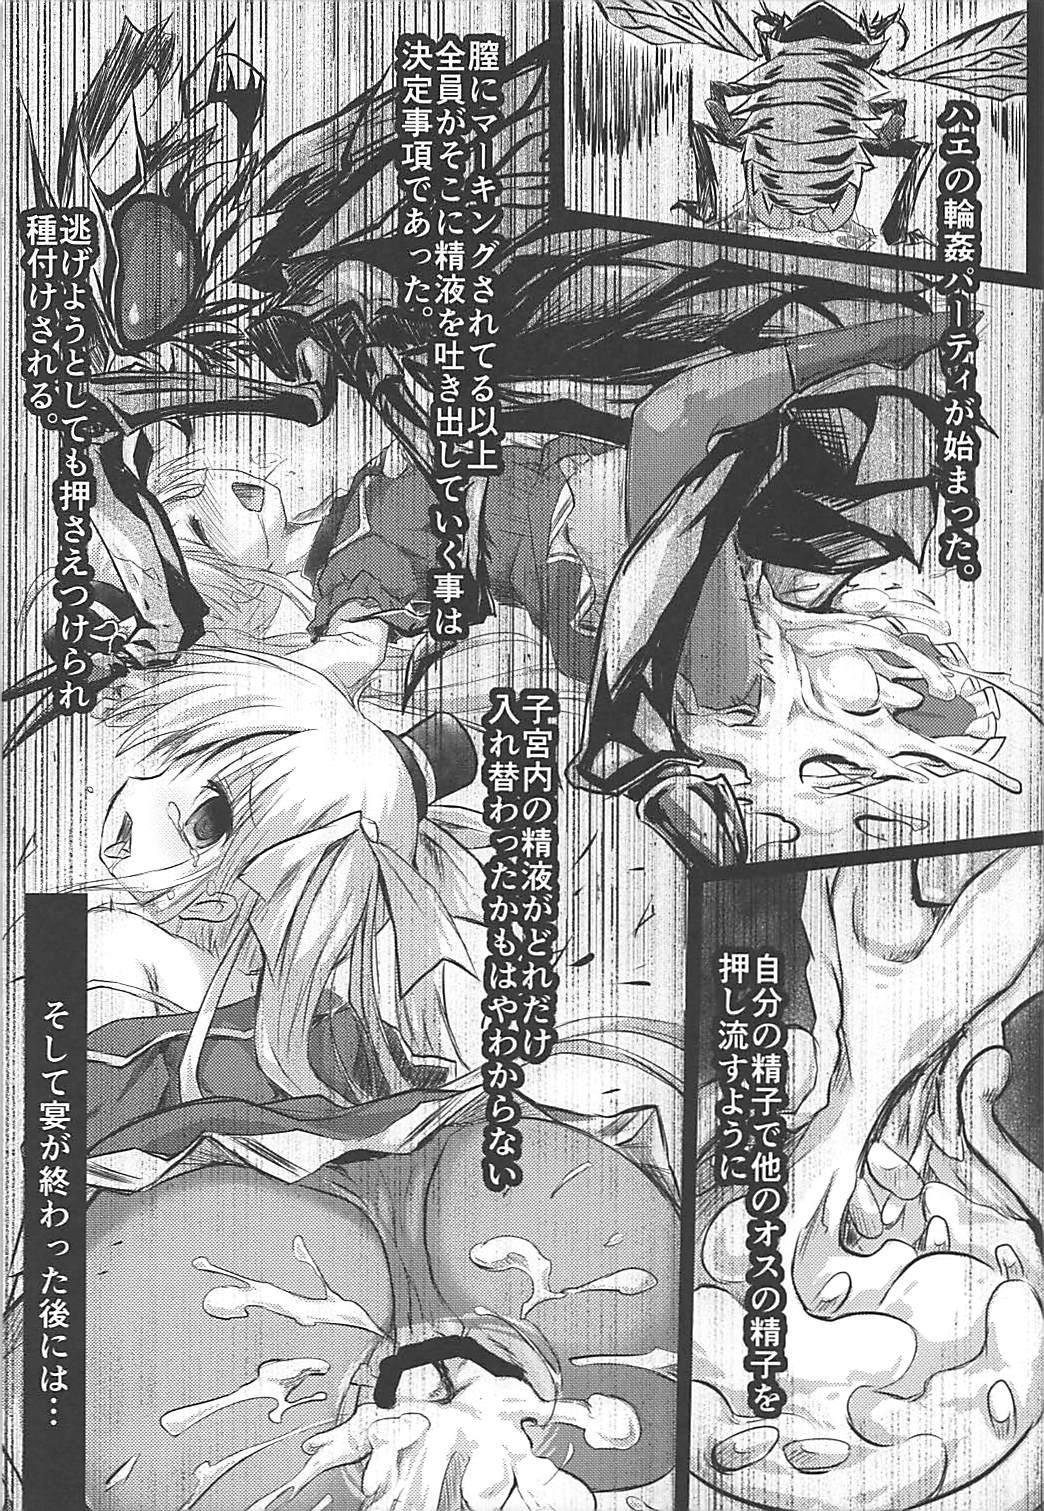 Gaichuu Higai Houkokusho 16